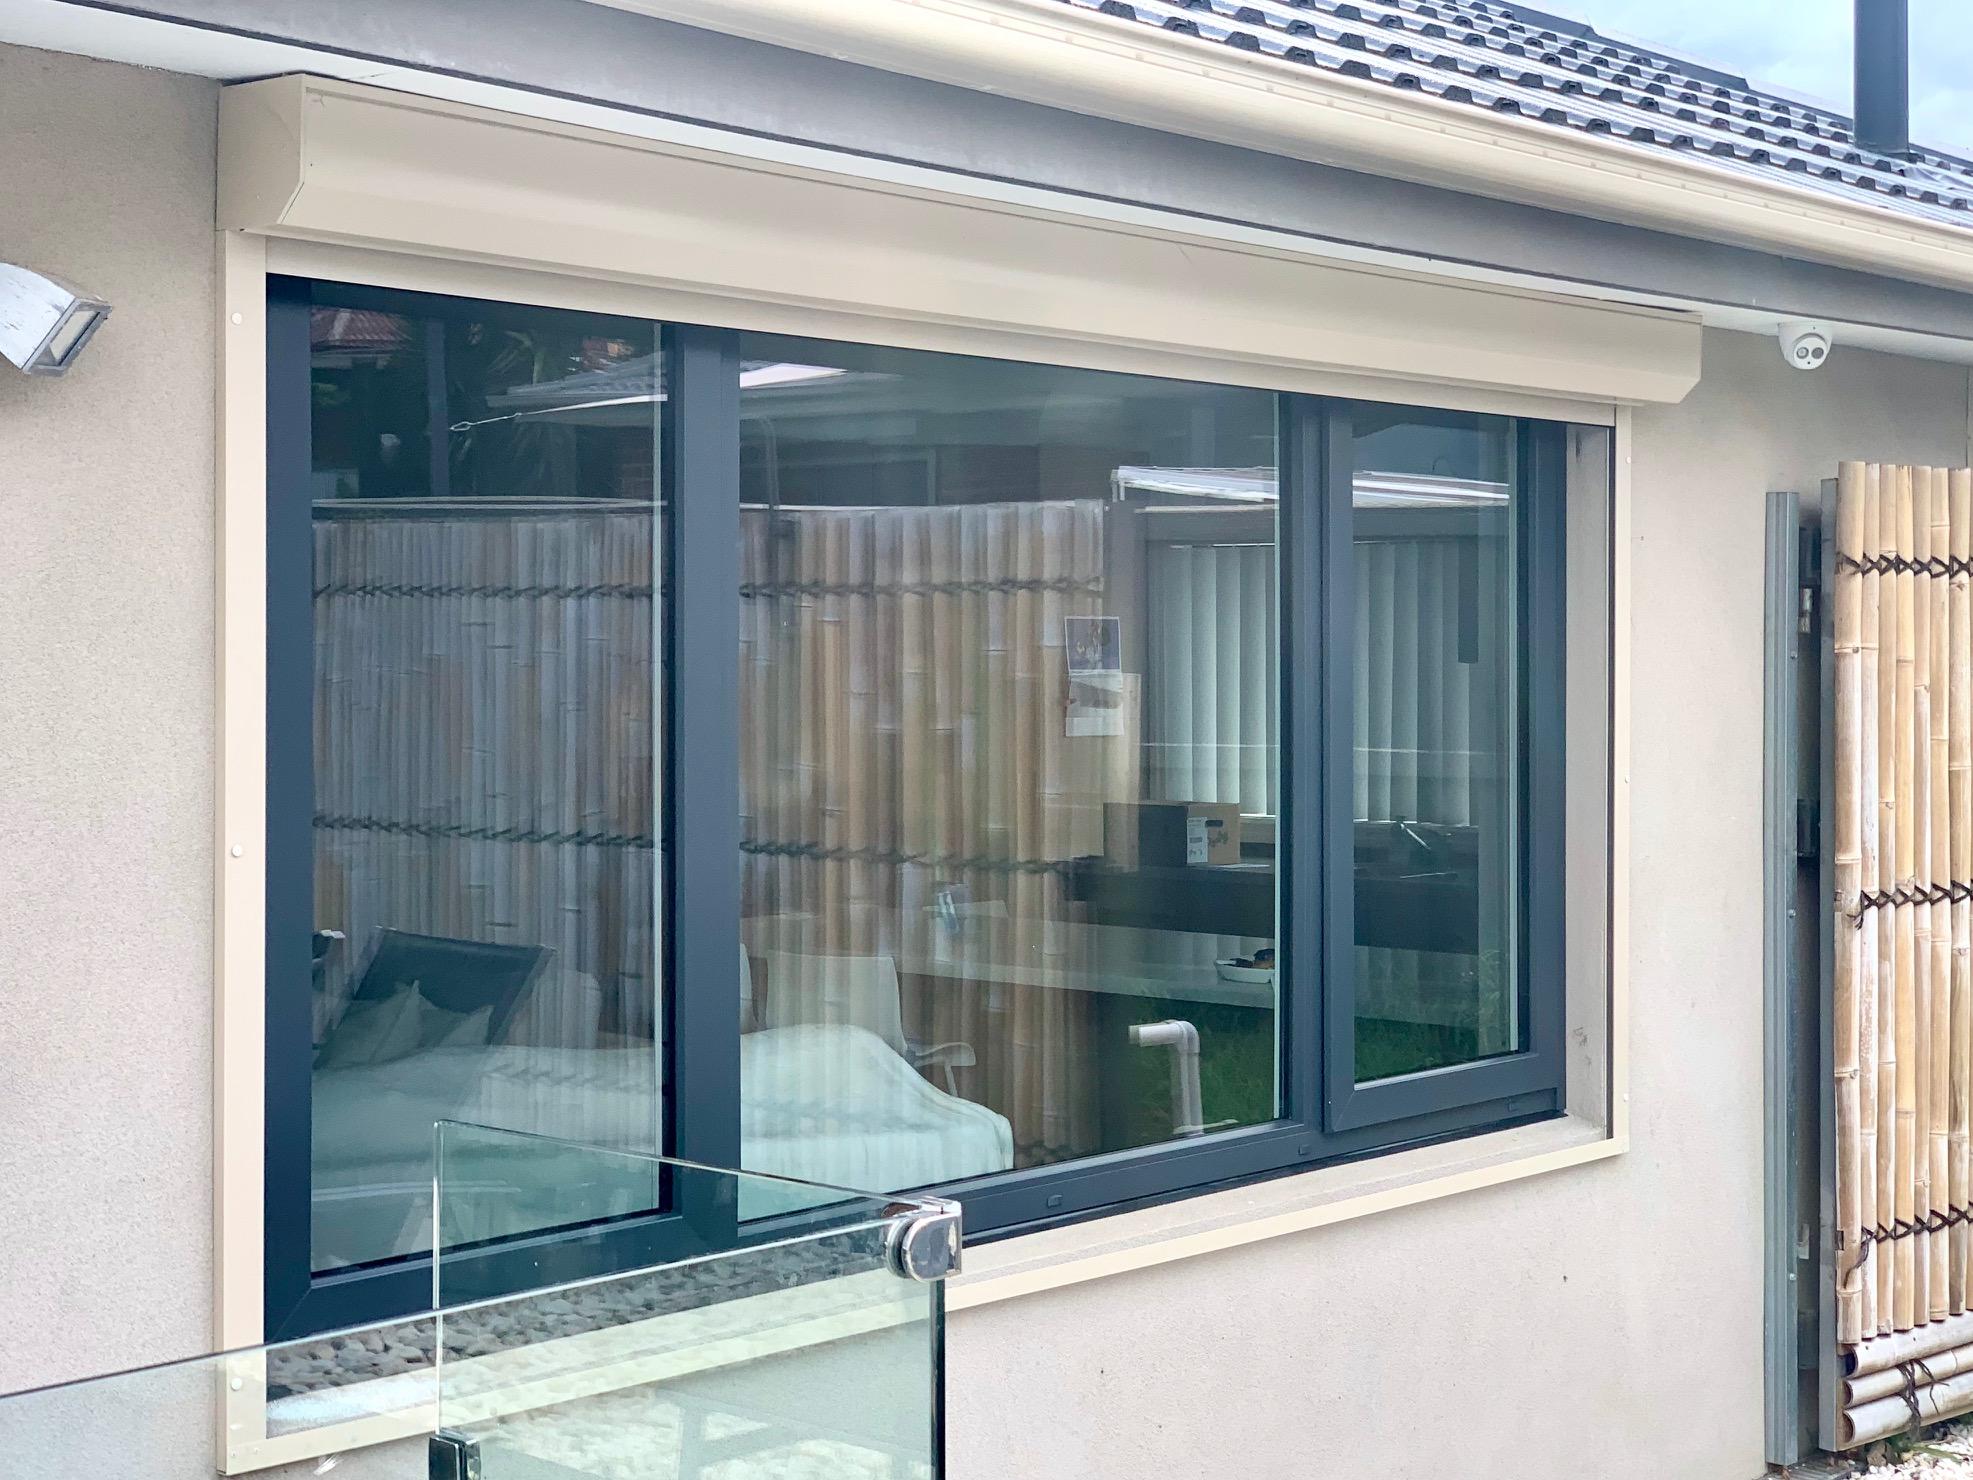 Tropical White/Anthracite uPVC awning windows